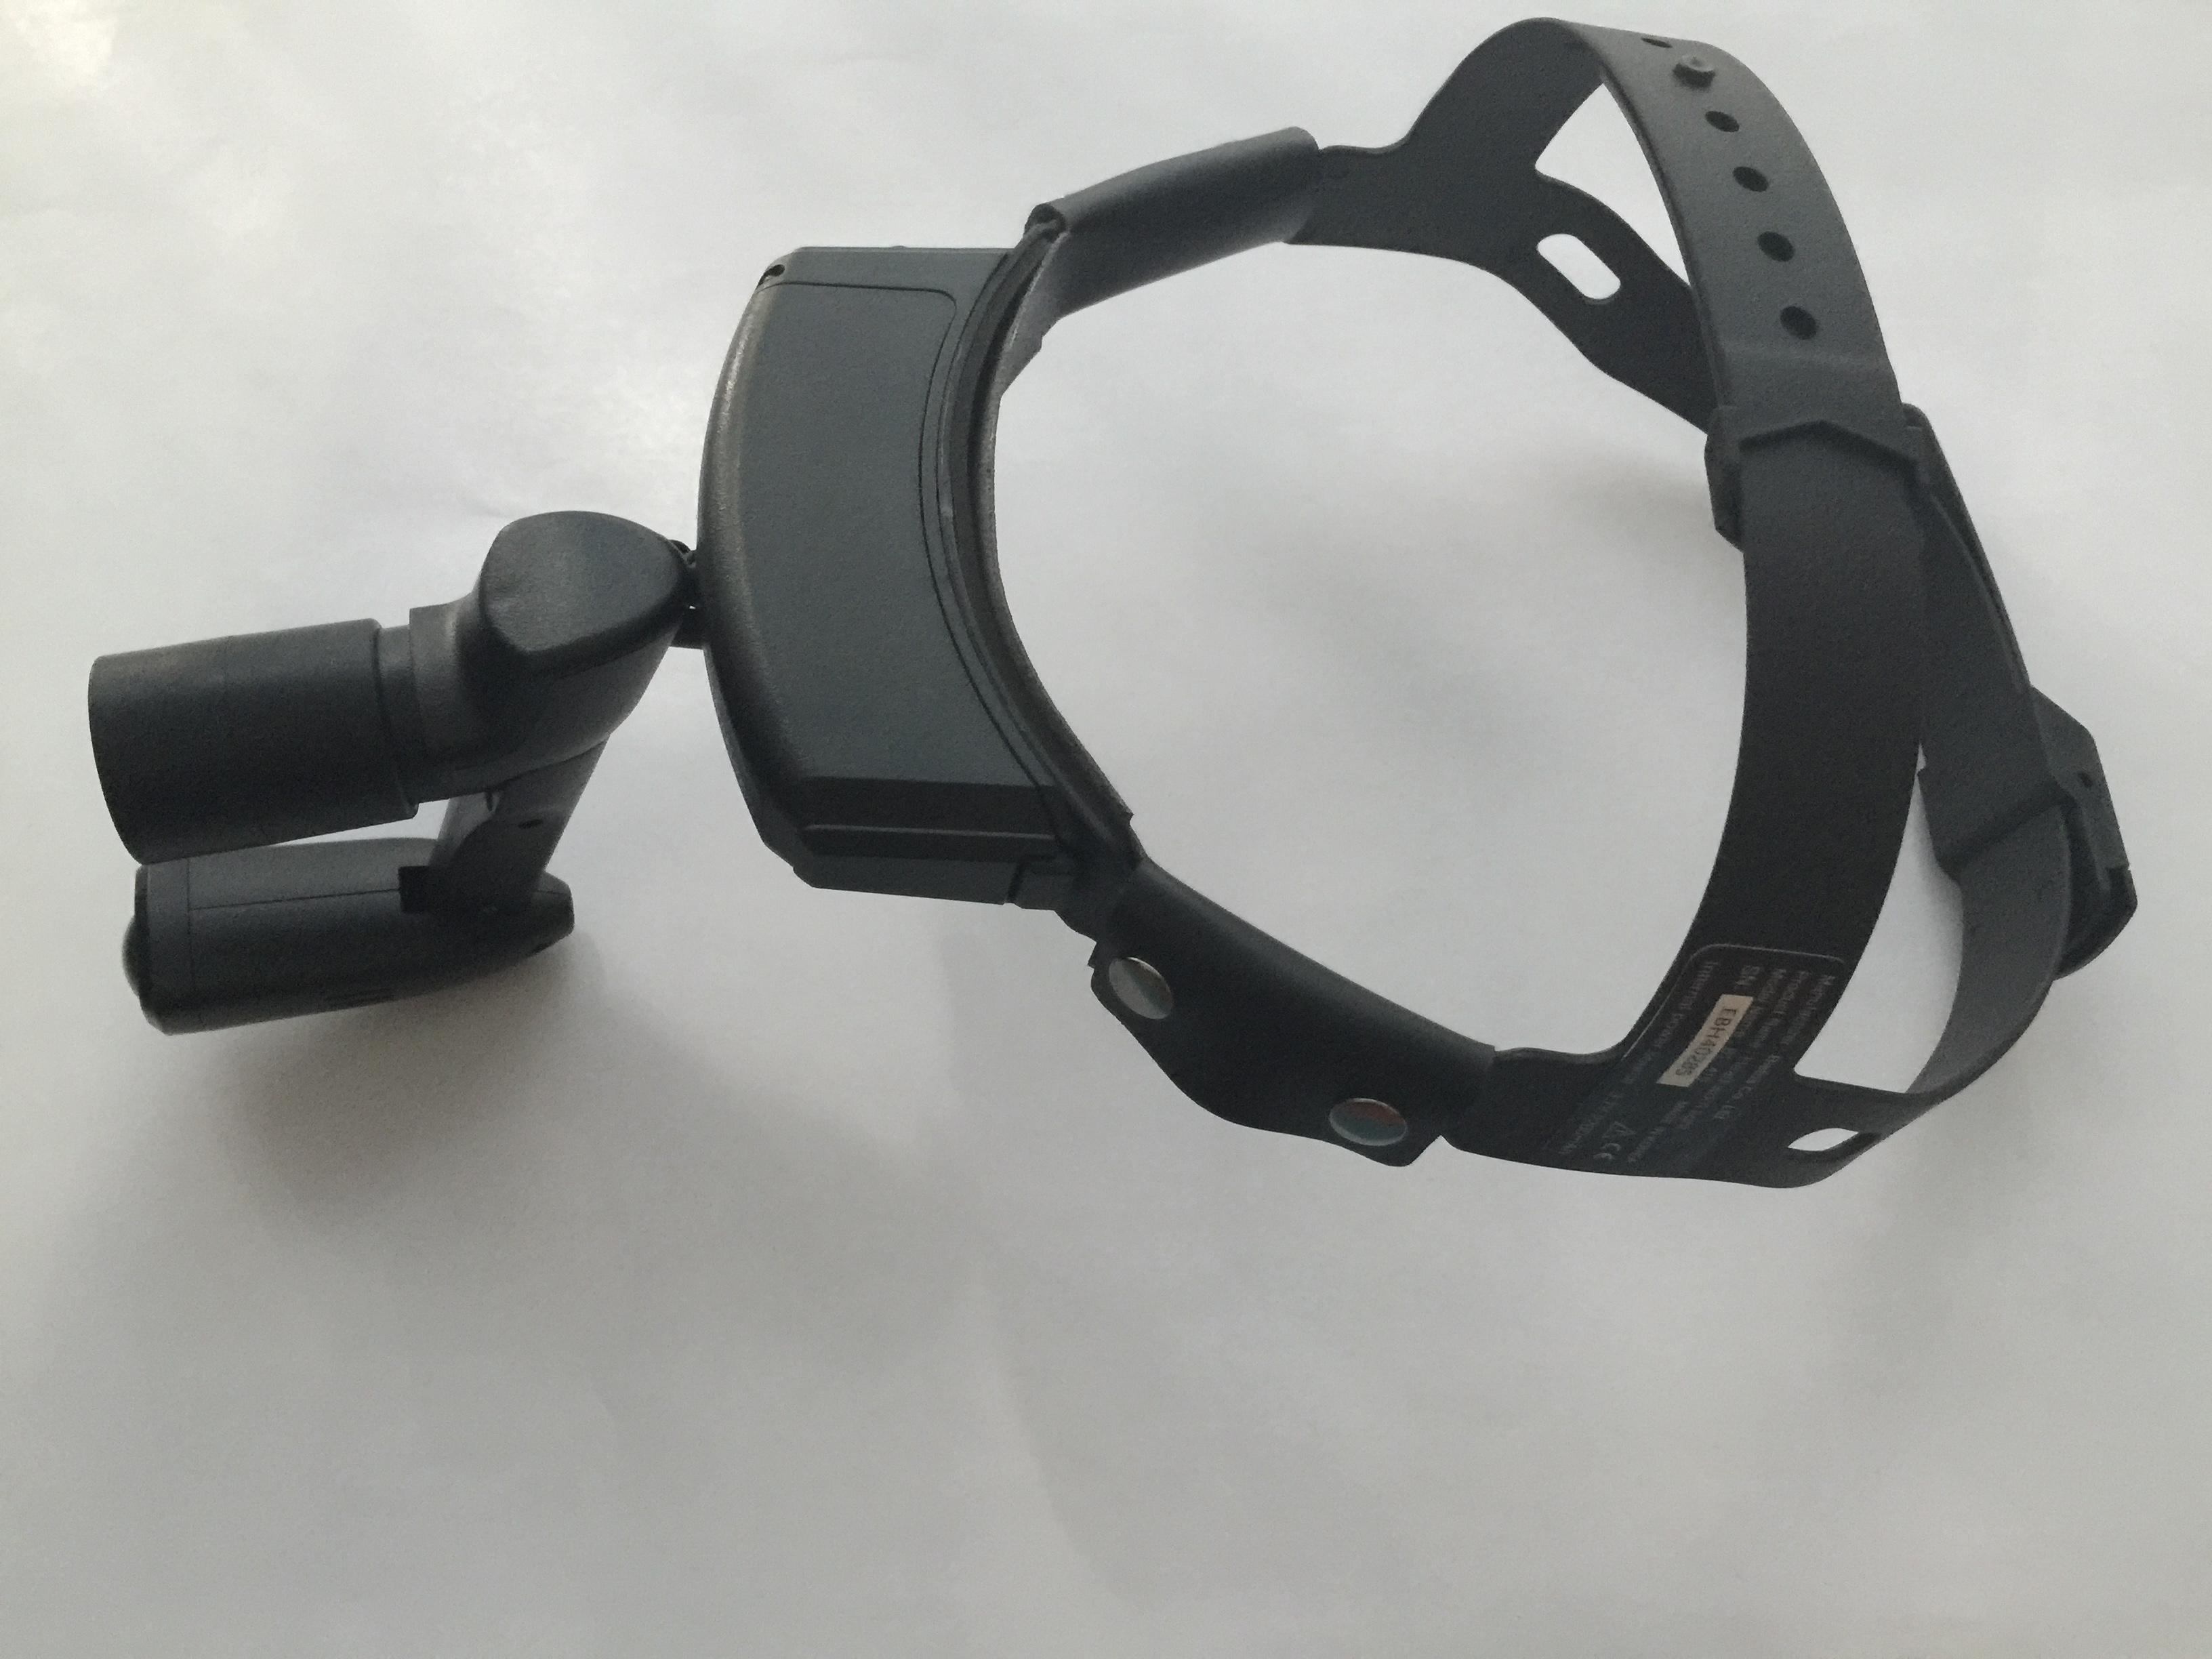 Lampa frontala LED BT-410A, fascicul de lumina ajustabil, inclusiv lampa Astral